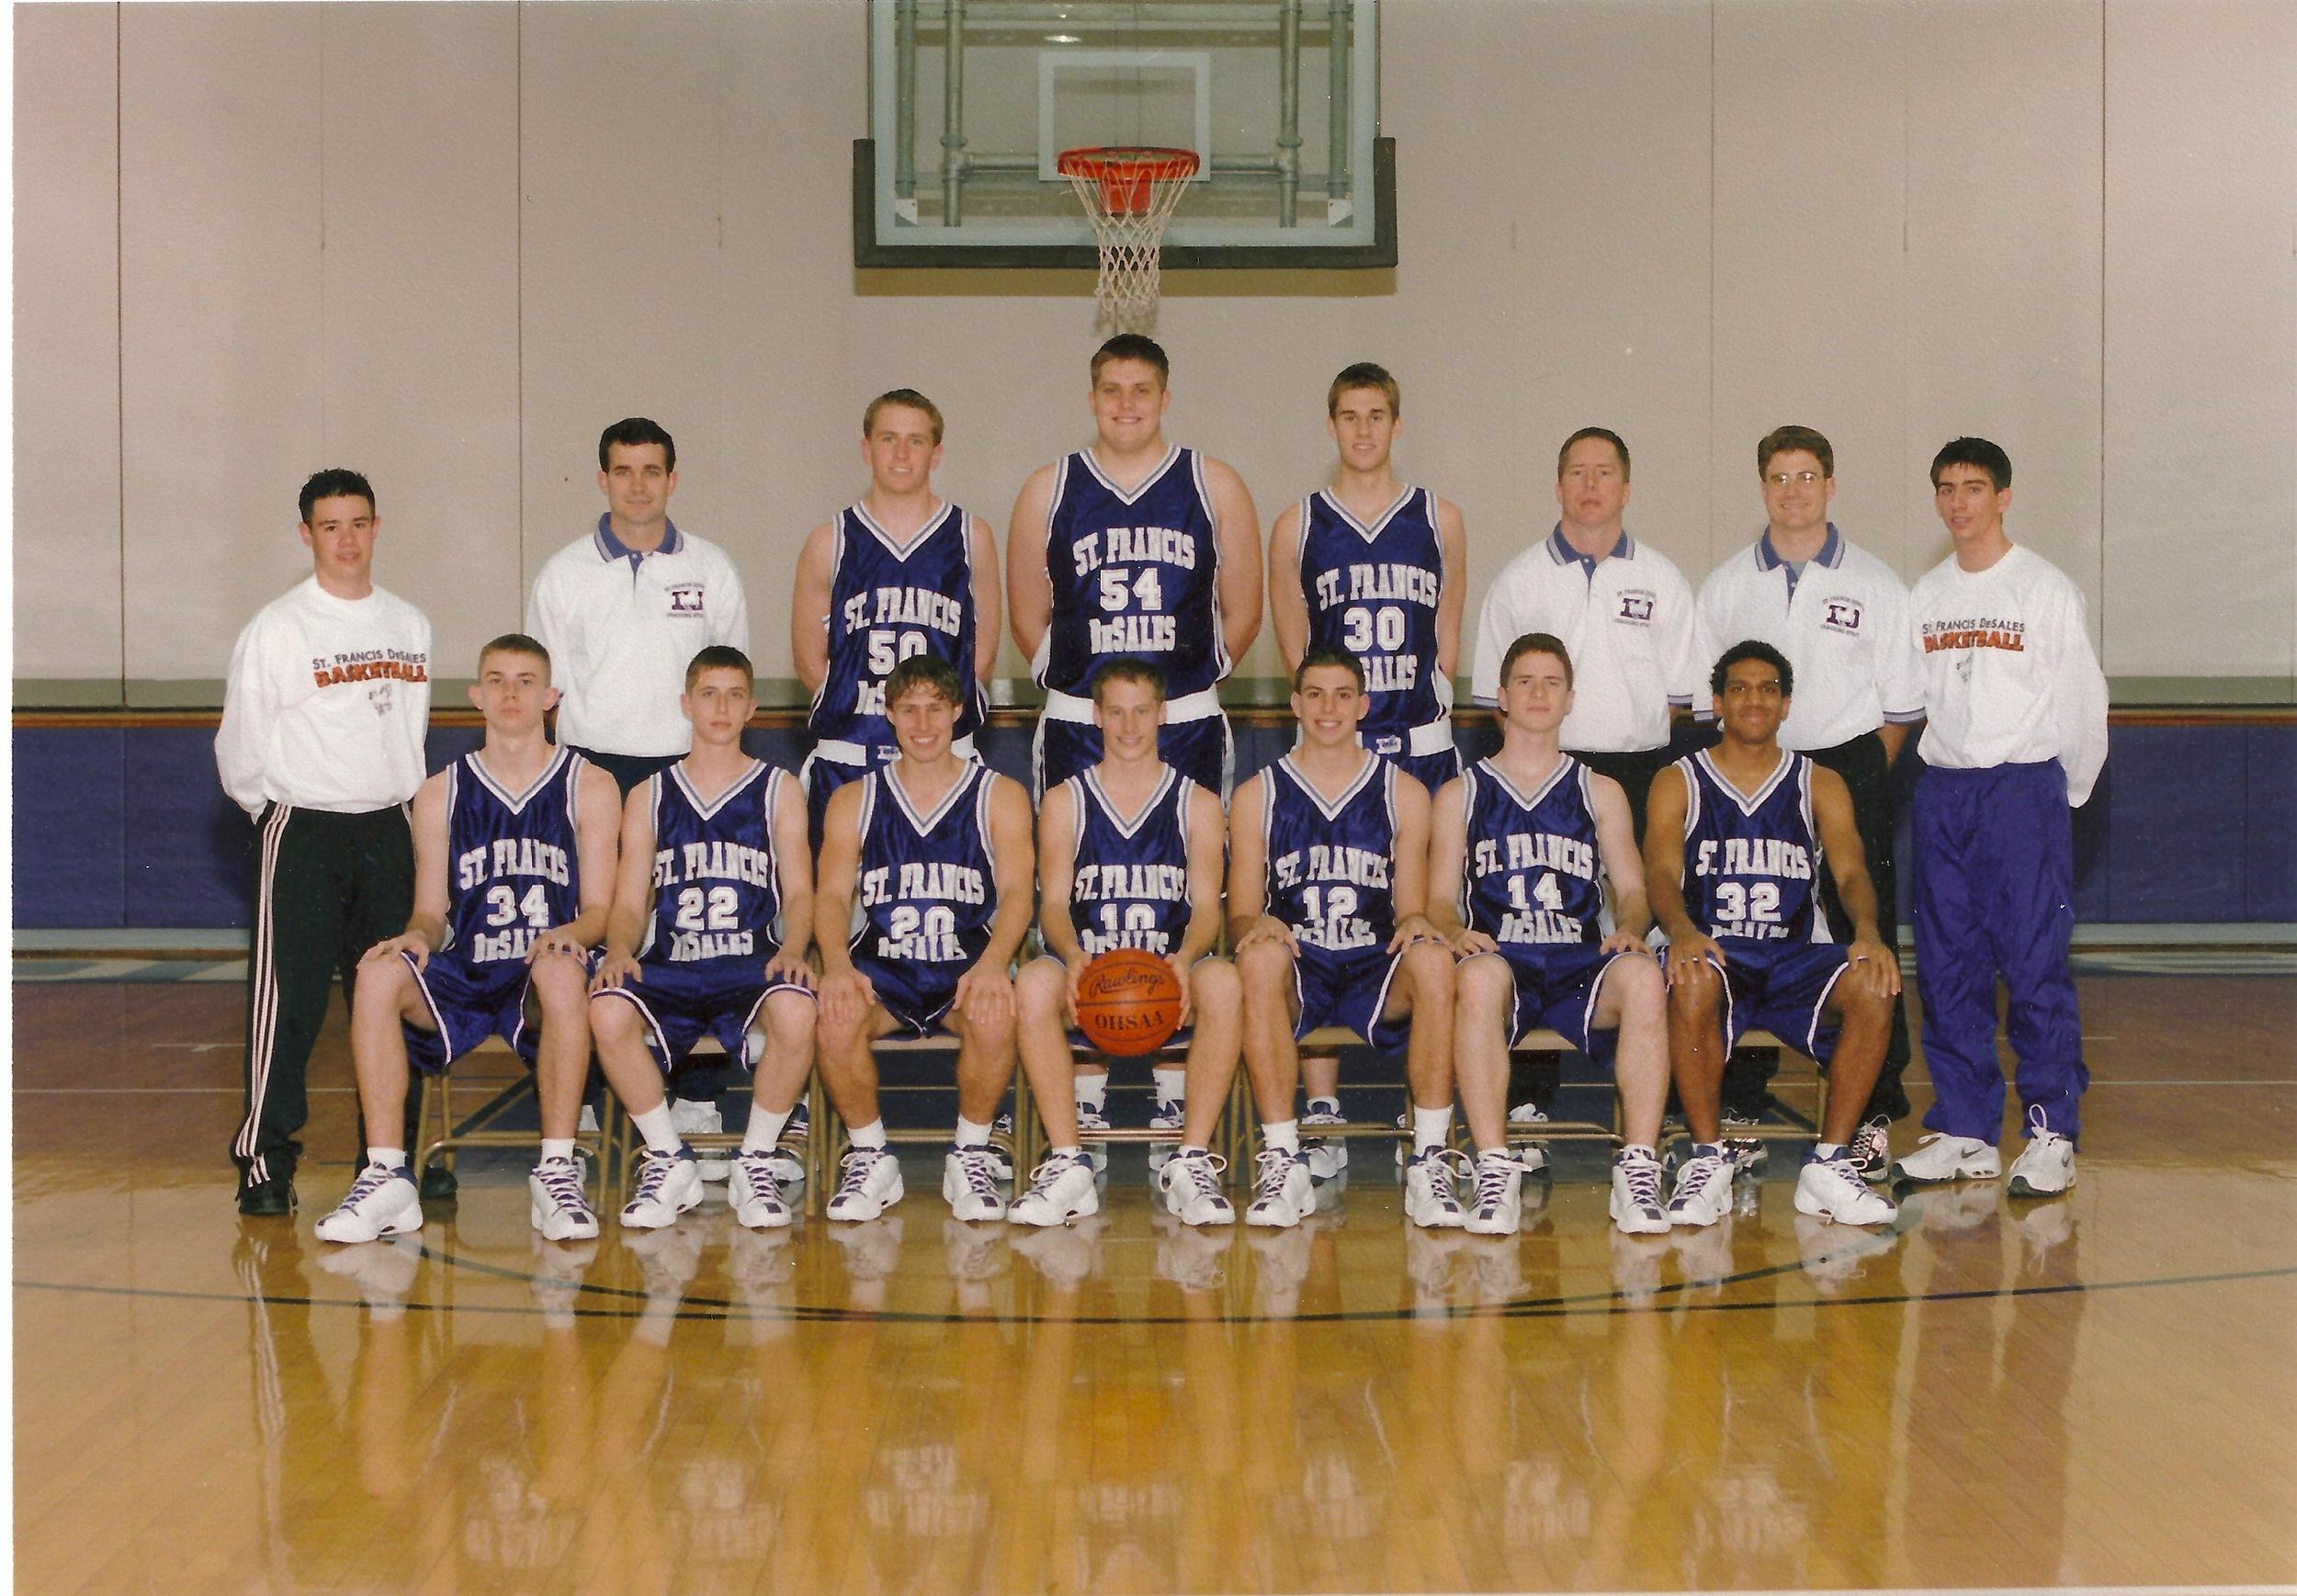 2001 CCL Champions